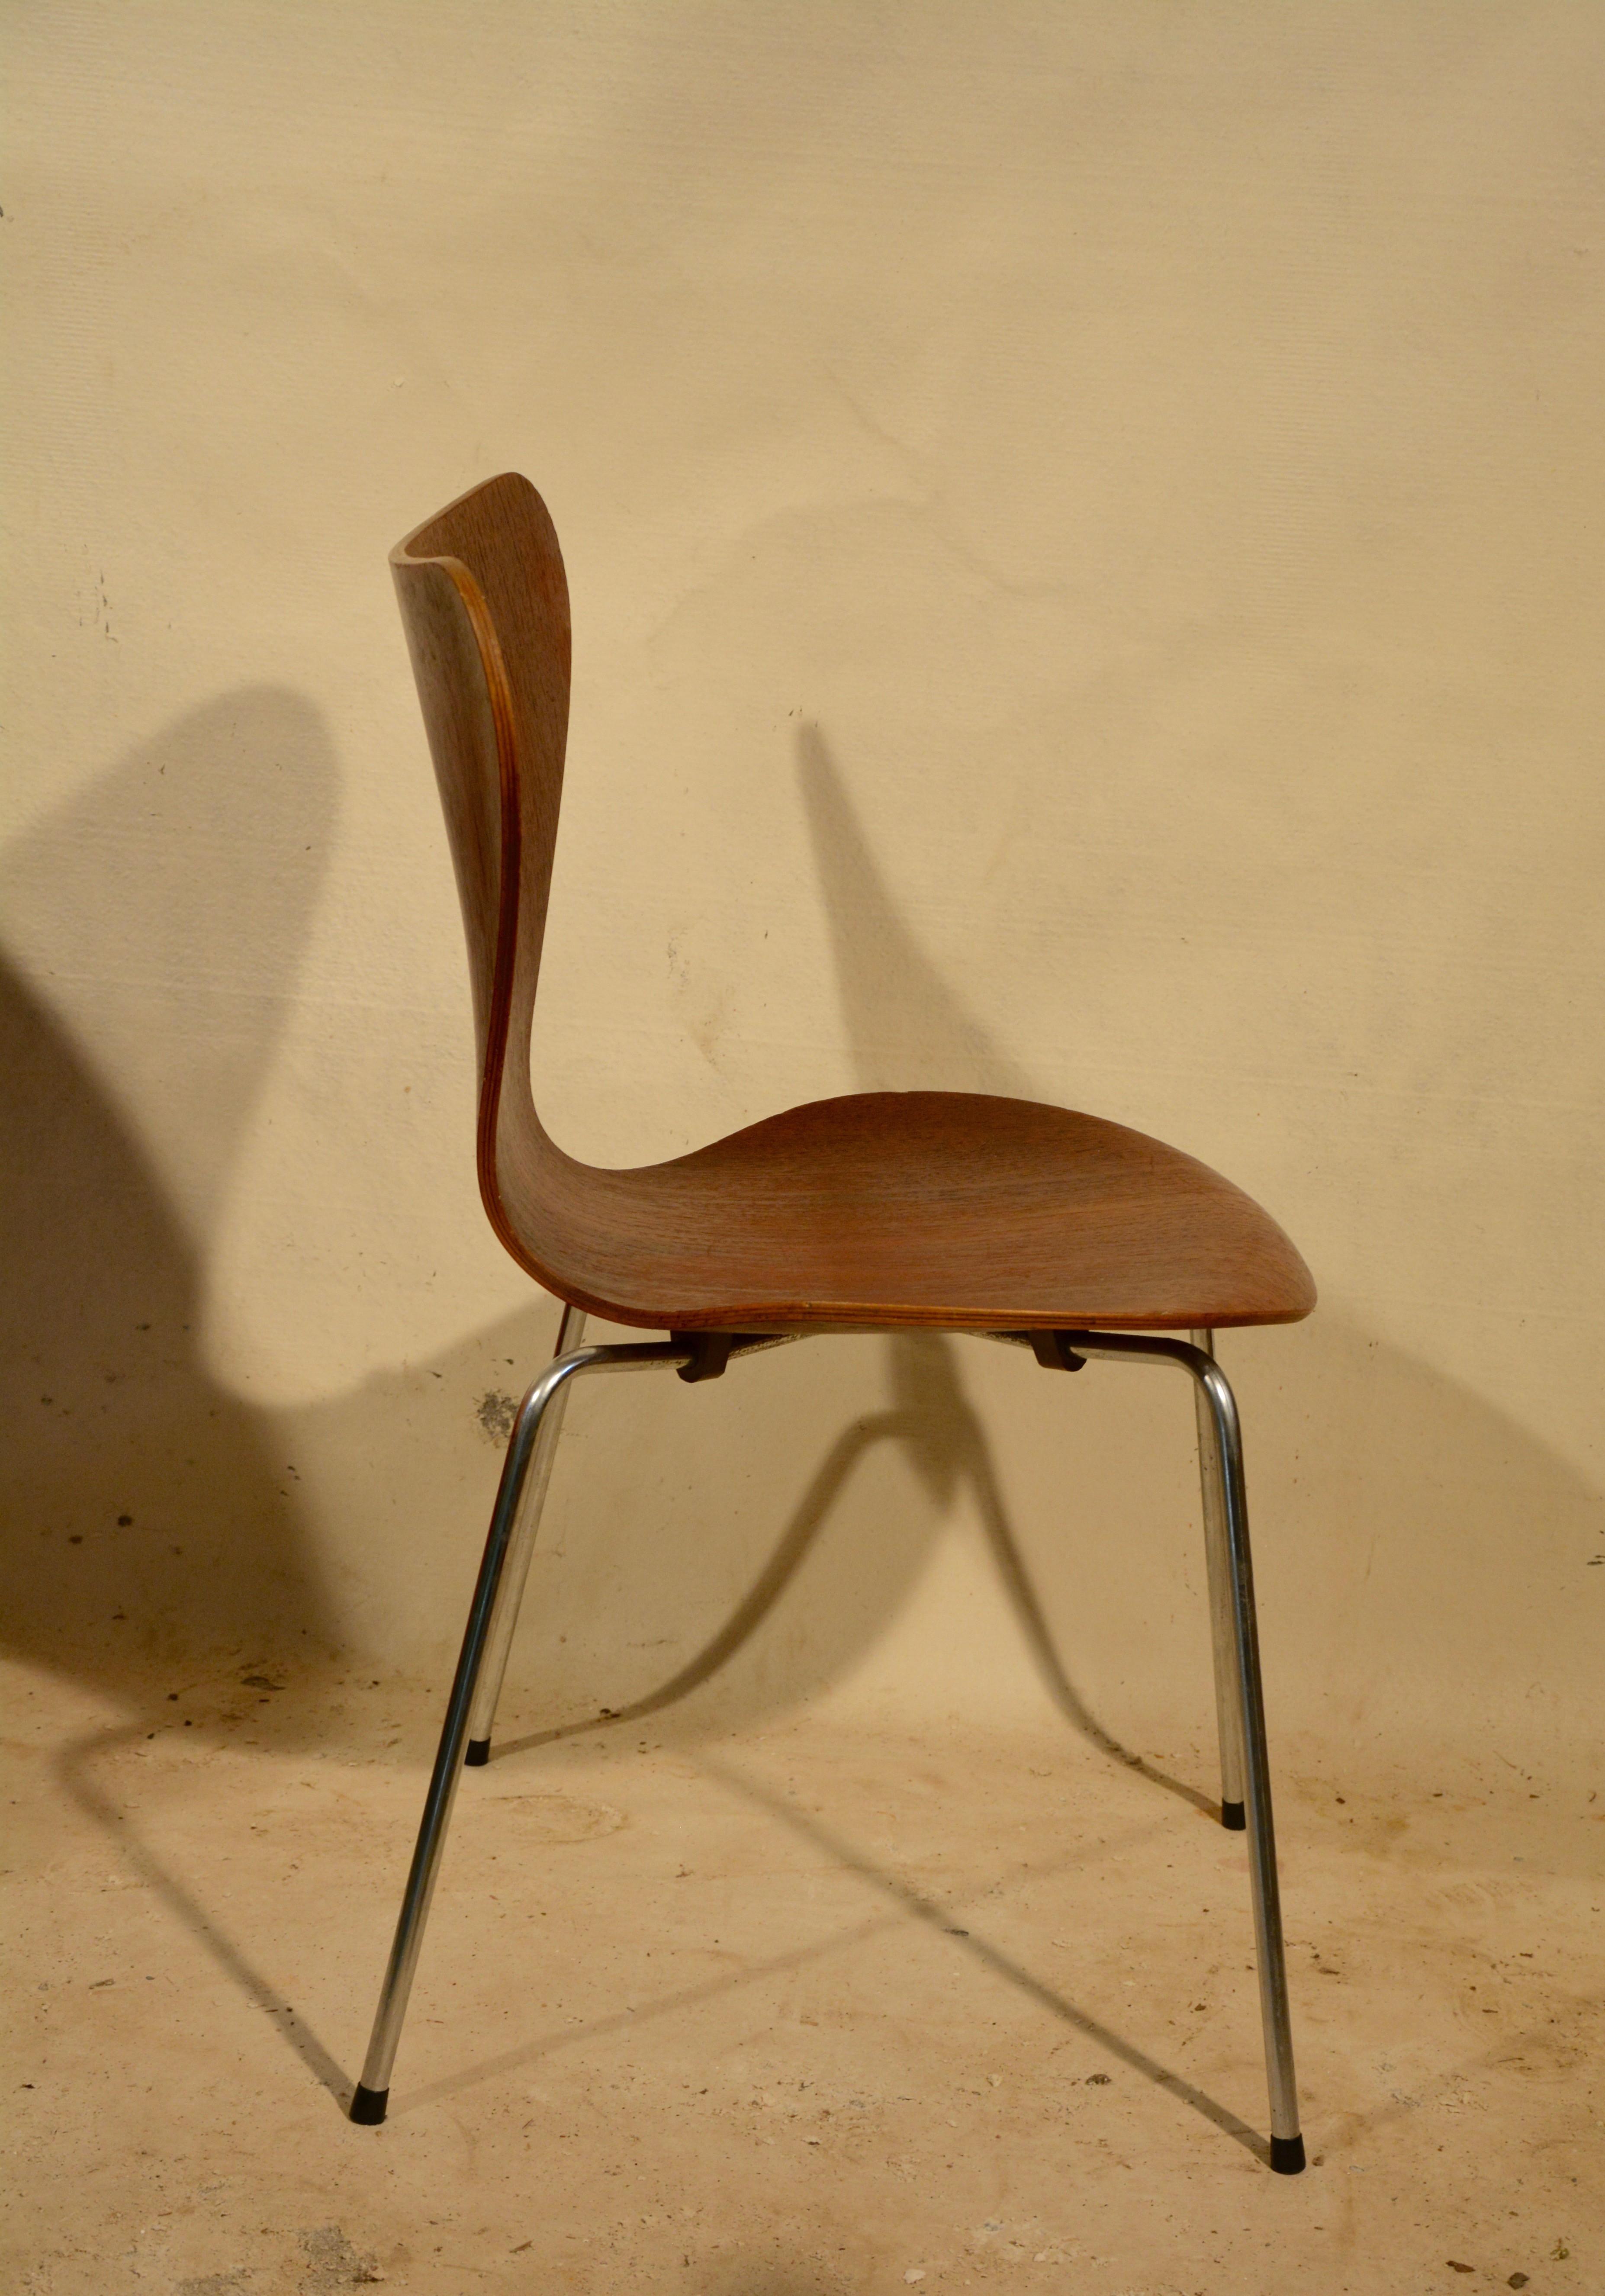 fritz hansen serie 7 chair in teak arne jacobsen 1950s design. Black Bedroom Furniture Sets. Home Design Ideas